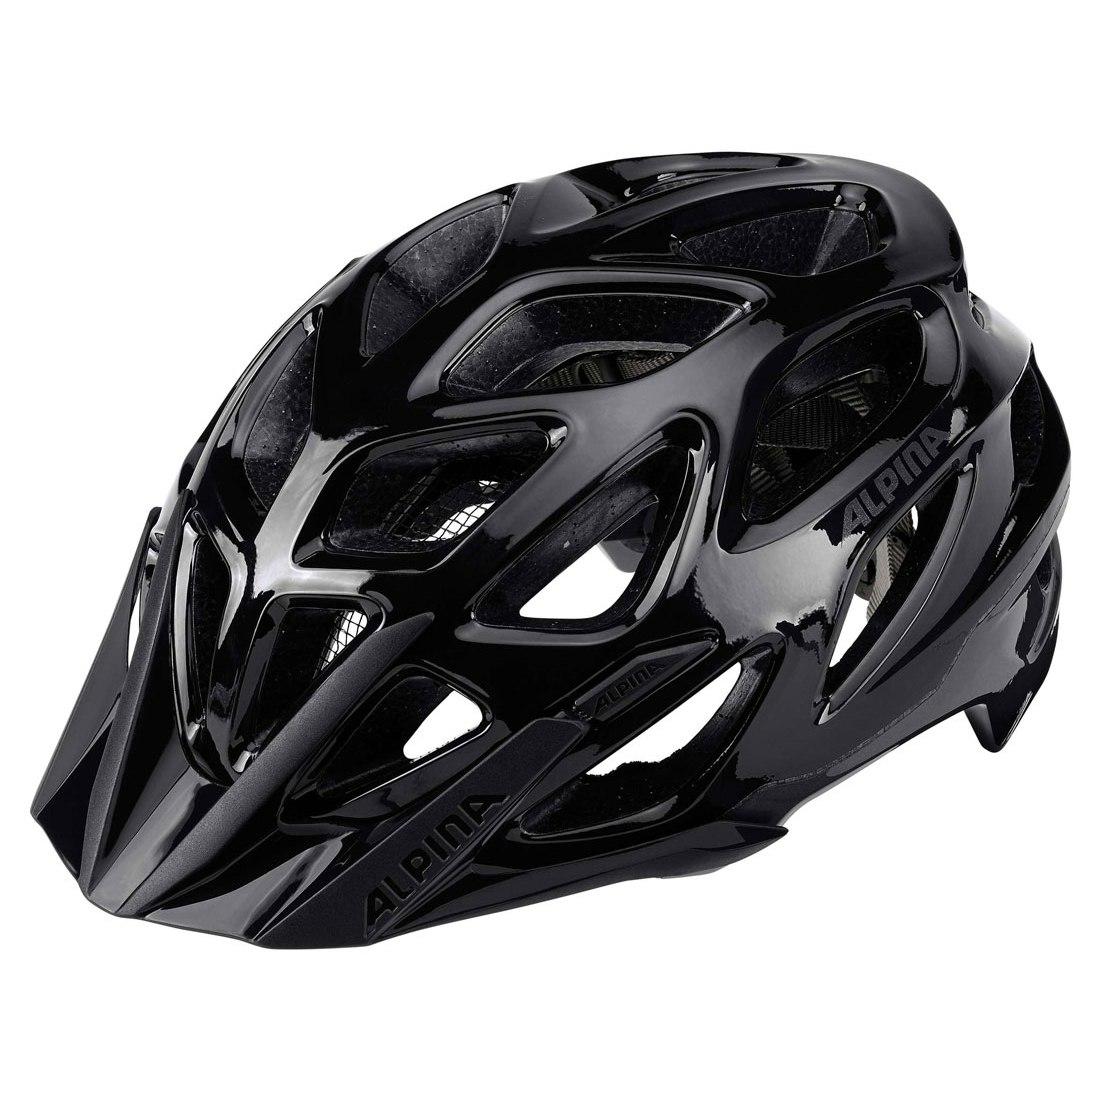 Alpina Mythos 3.0 Helmet - black-anthracite